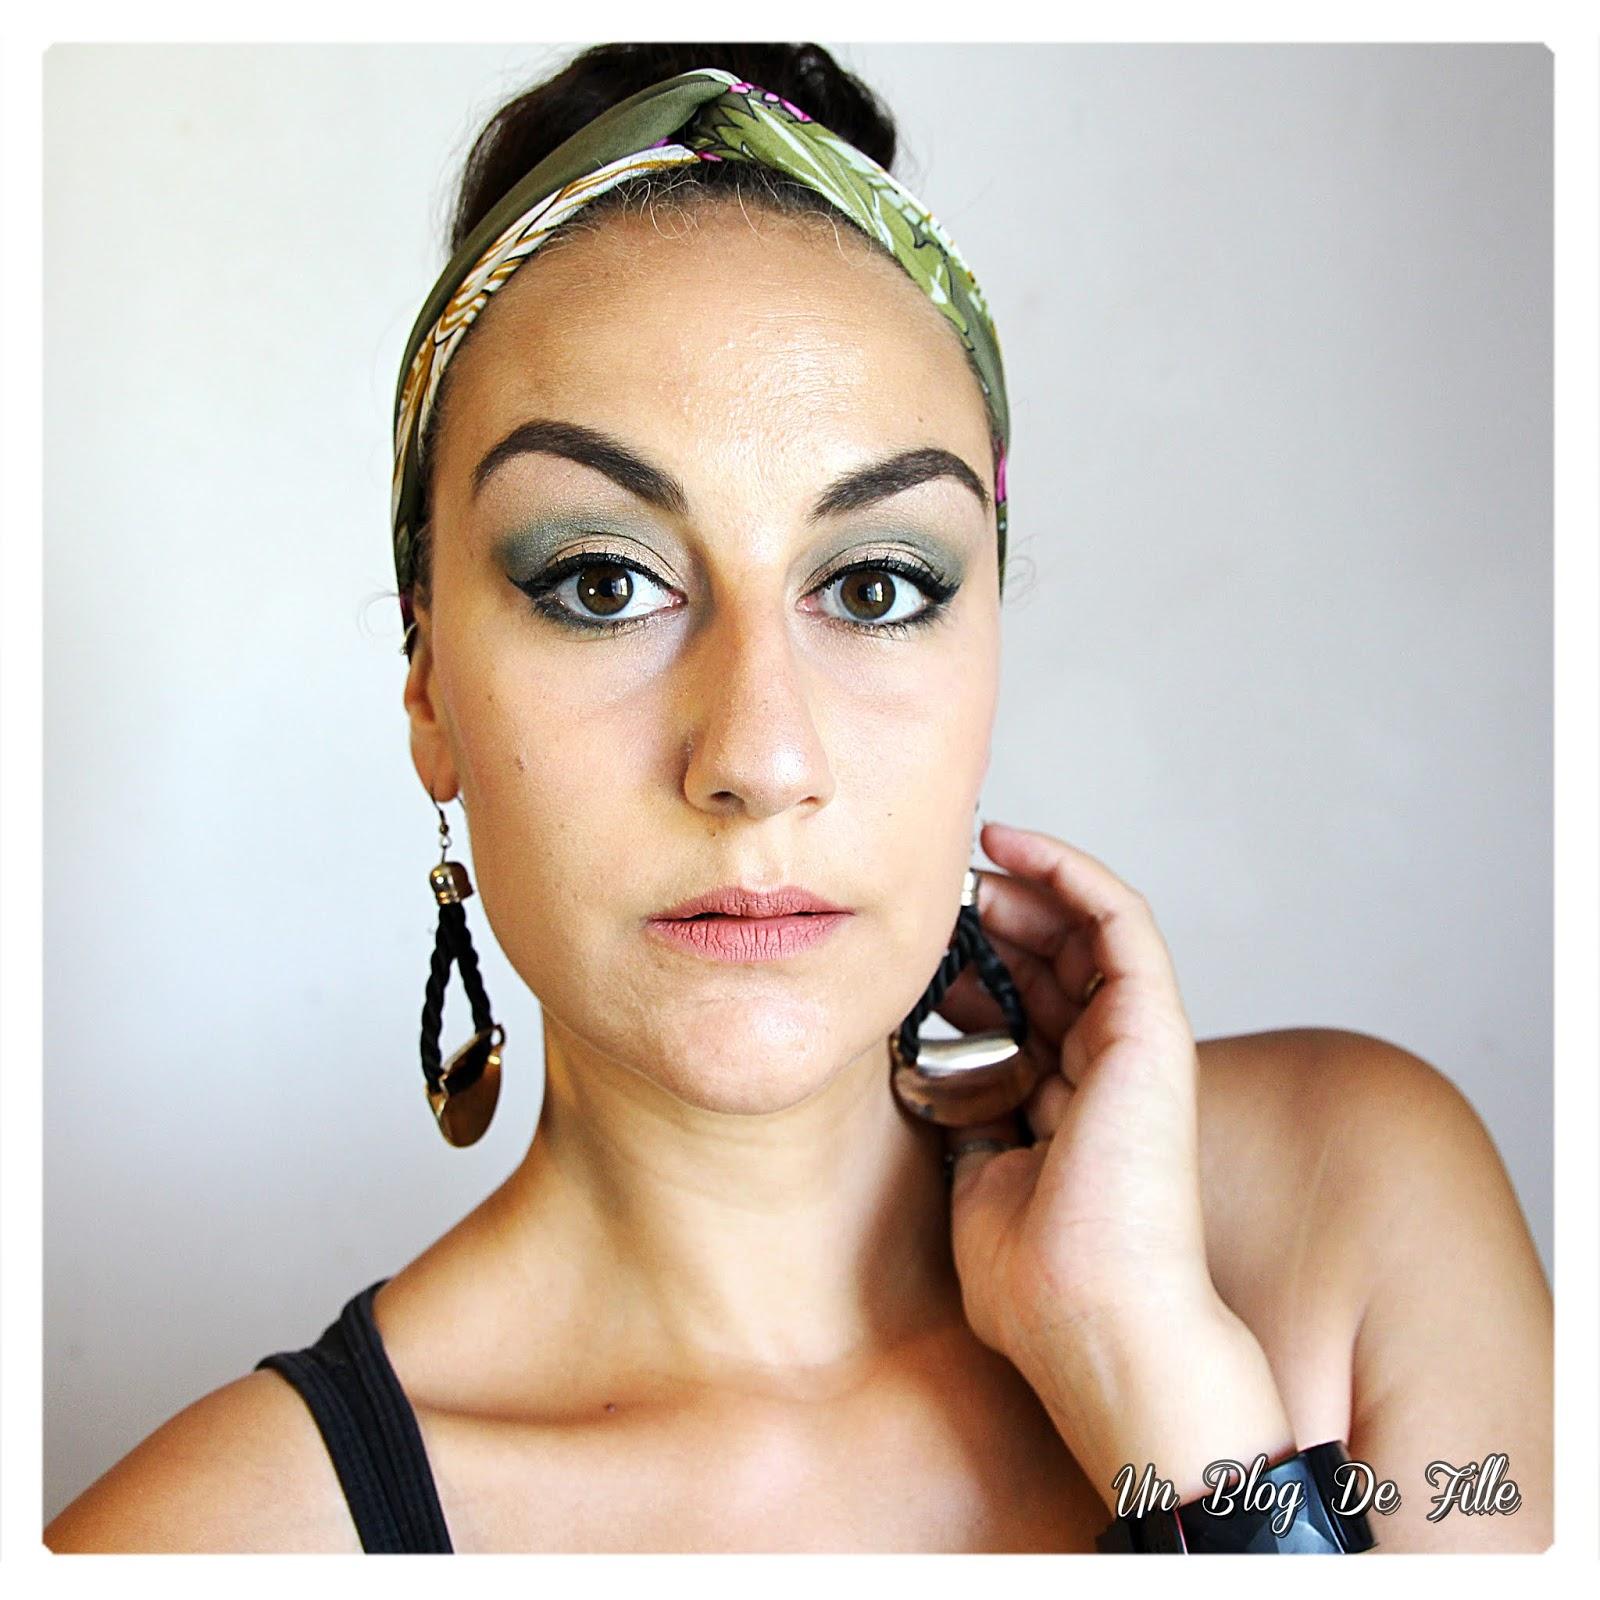 http://www.unblogdefille.fr/2018/08/maquillage-champagne-et-vert-foret.html